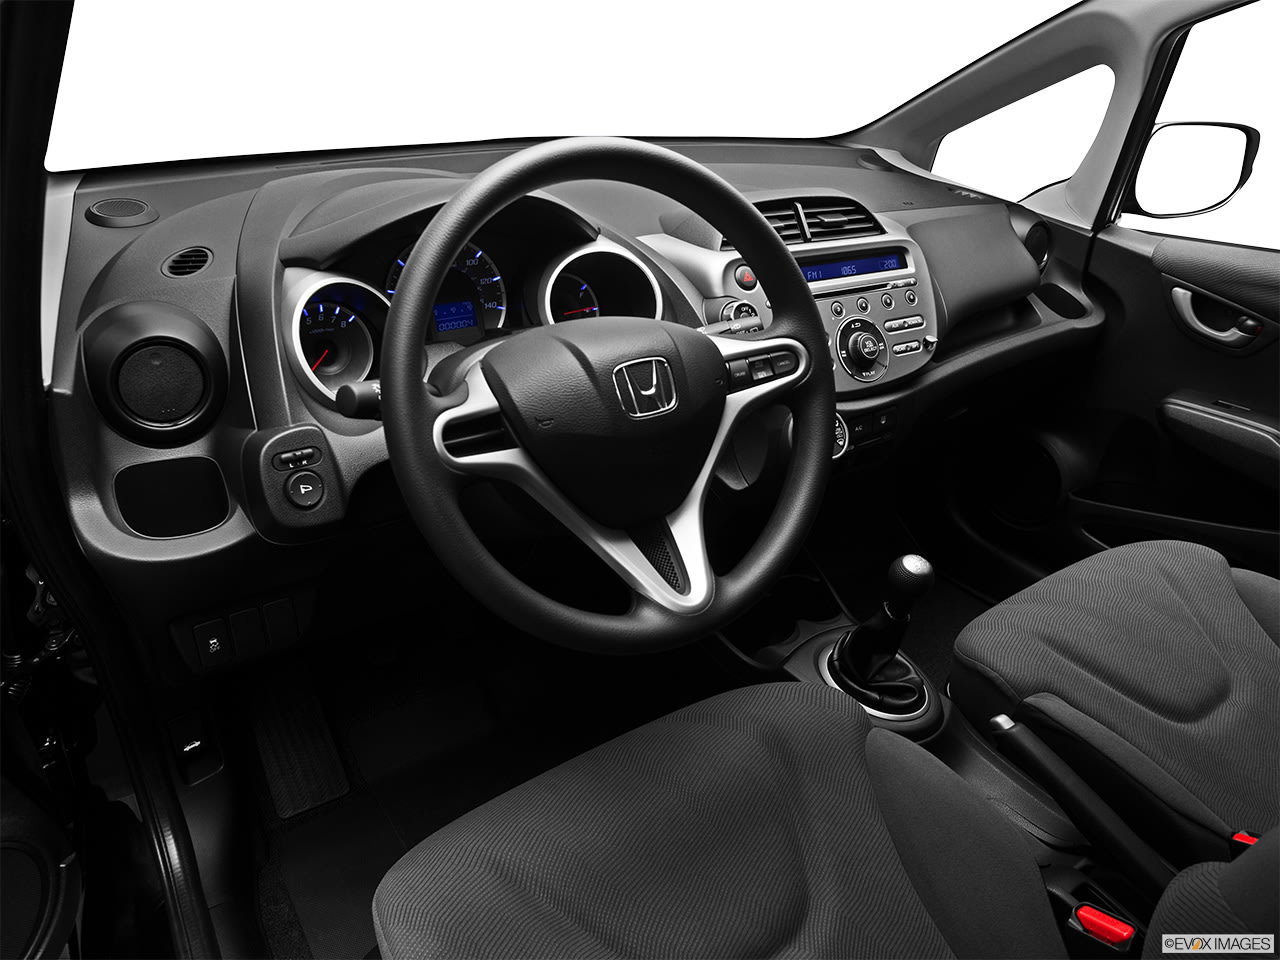 Honda Fit 2012 Interior